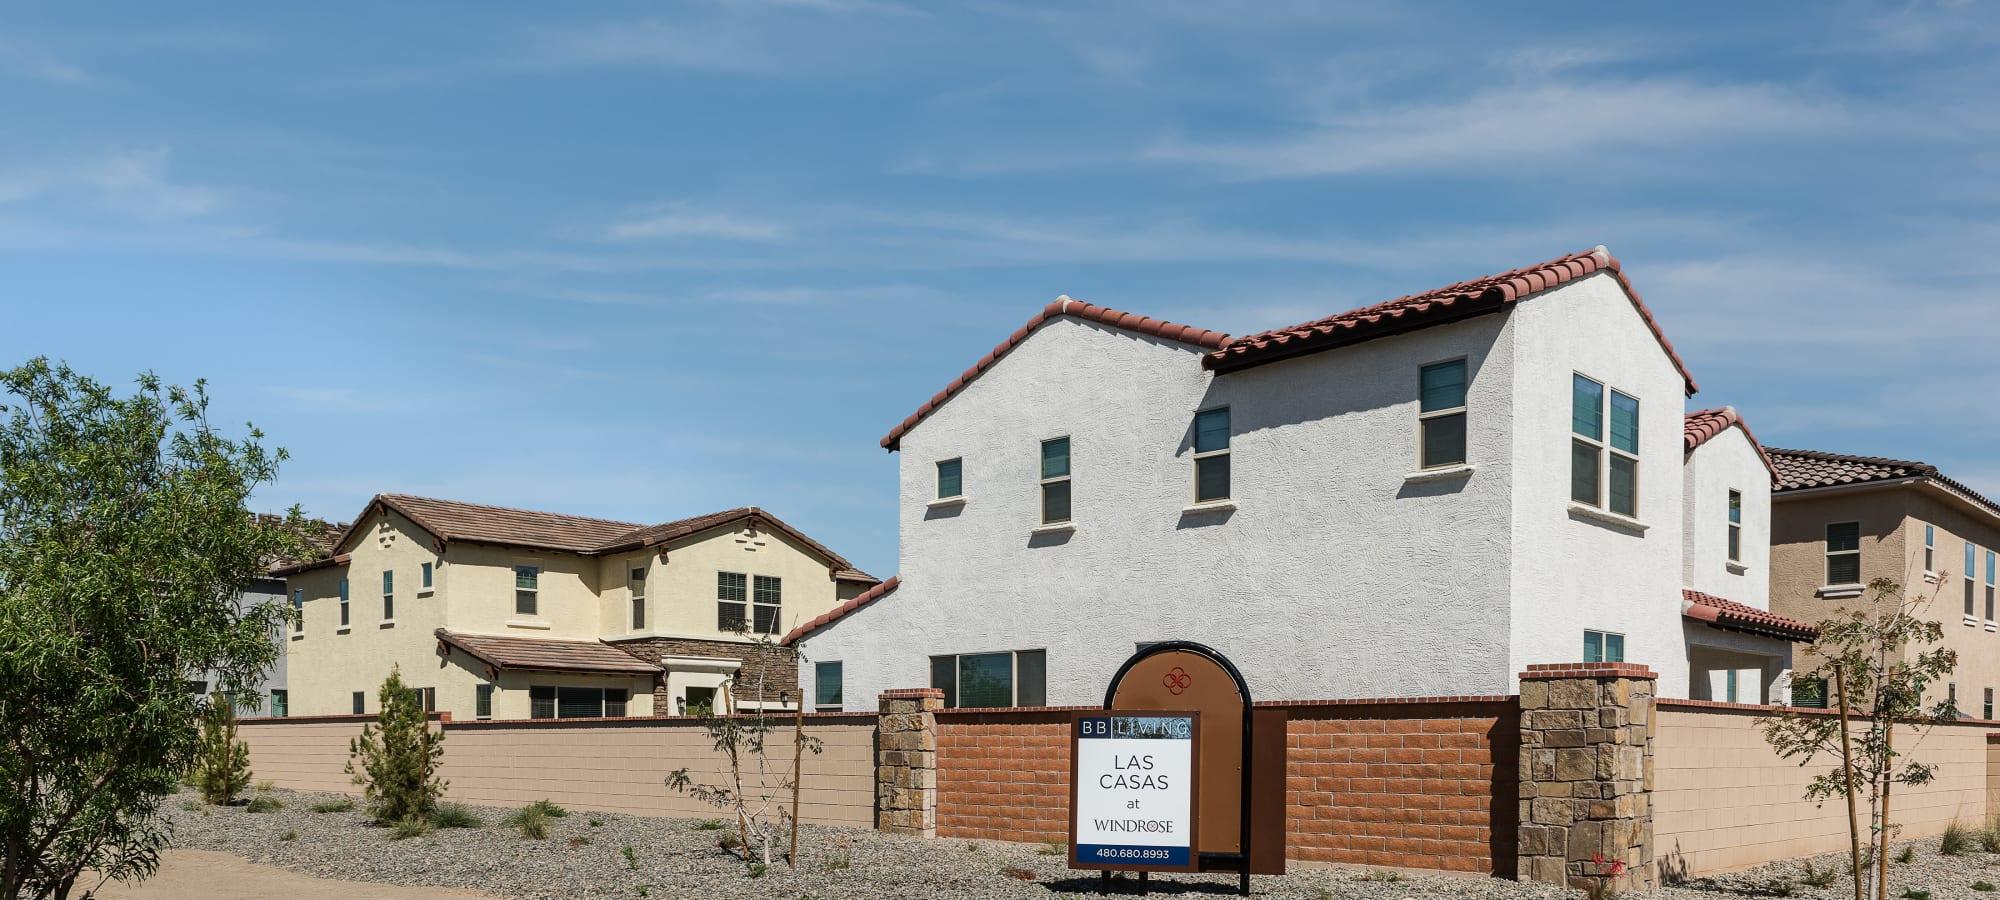 Street Exterior at Las Casas at Windrose in Litchfield Park, Arizona